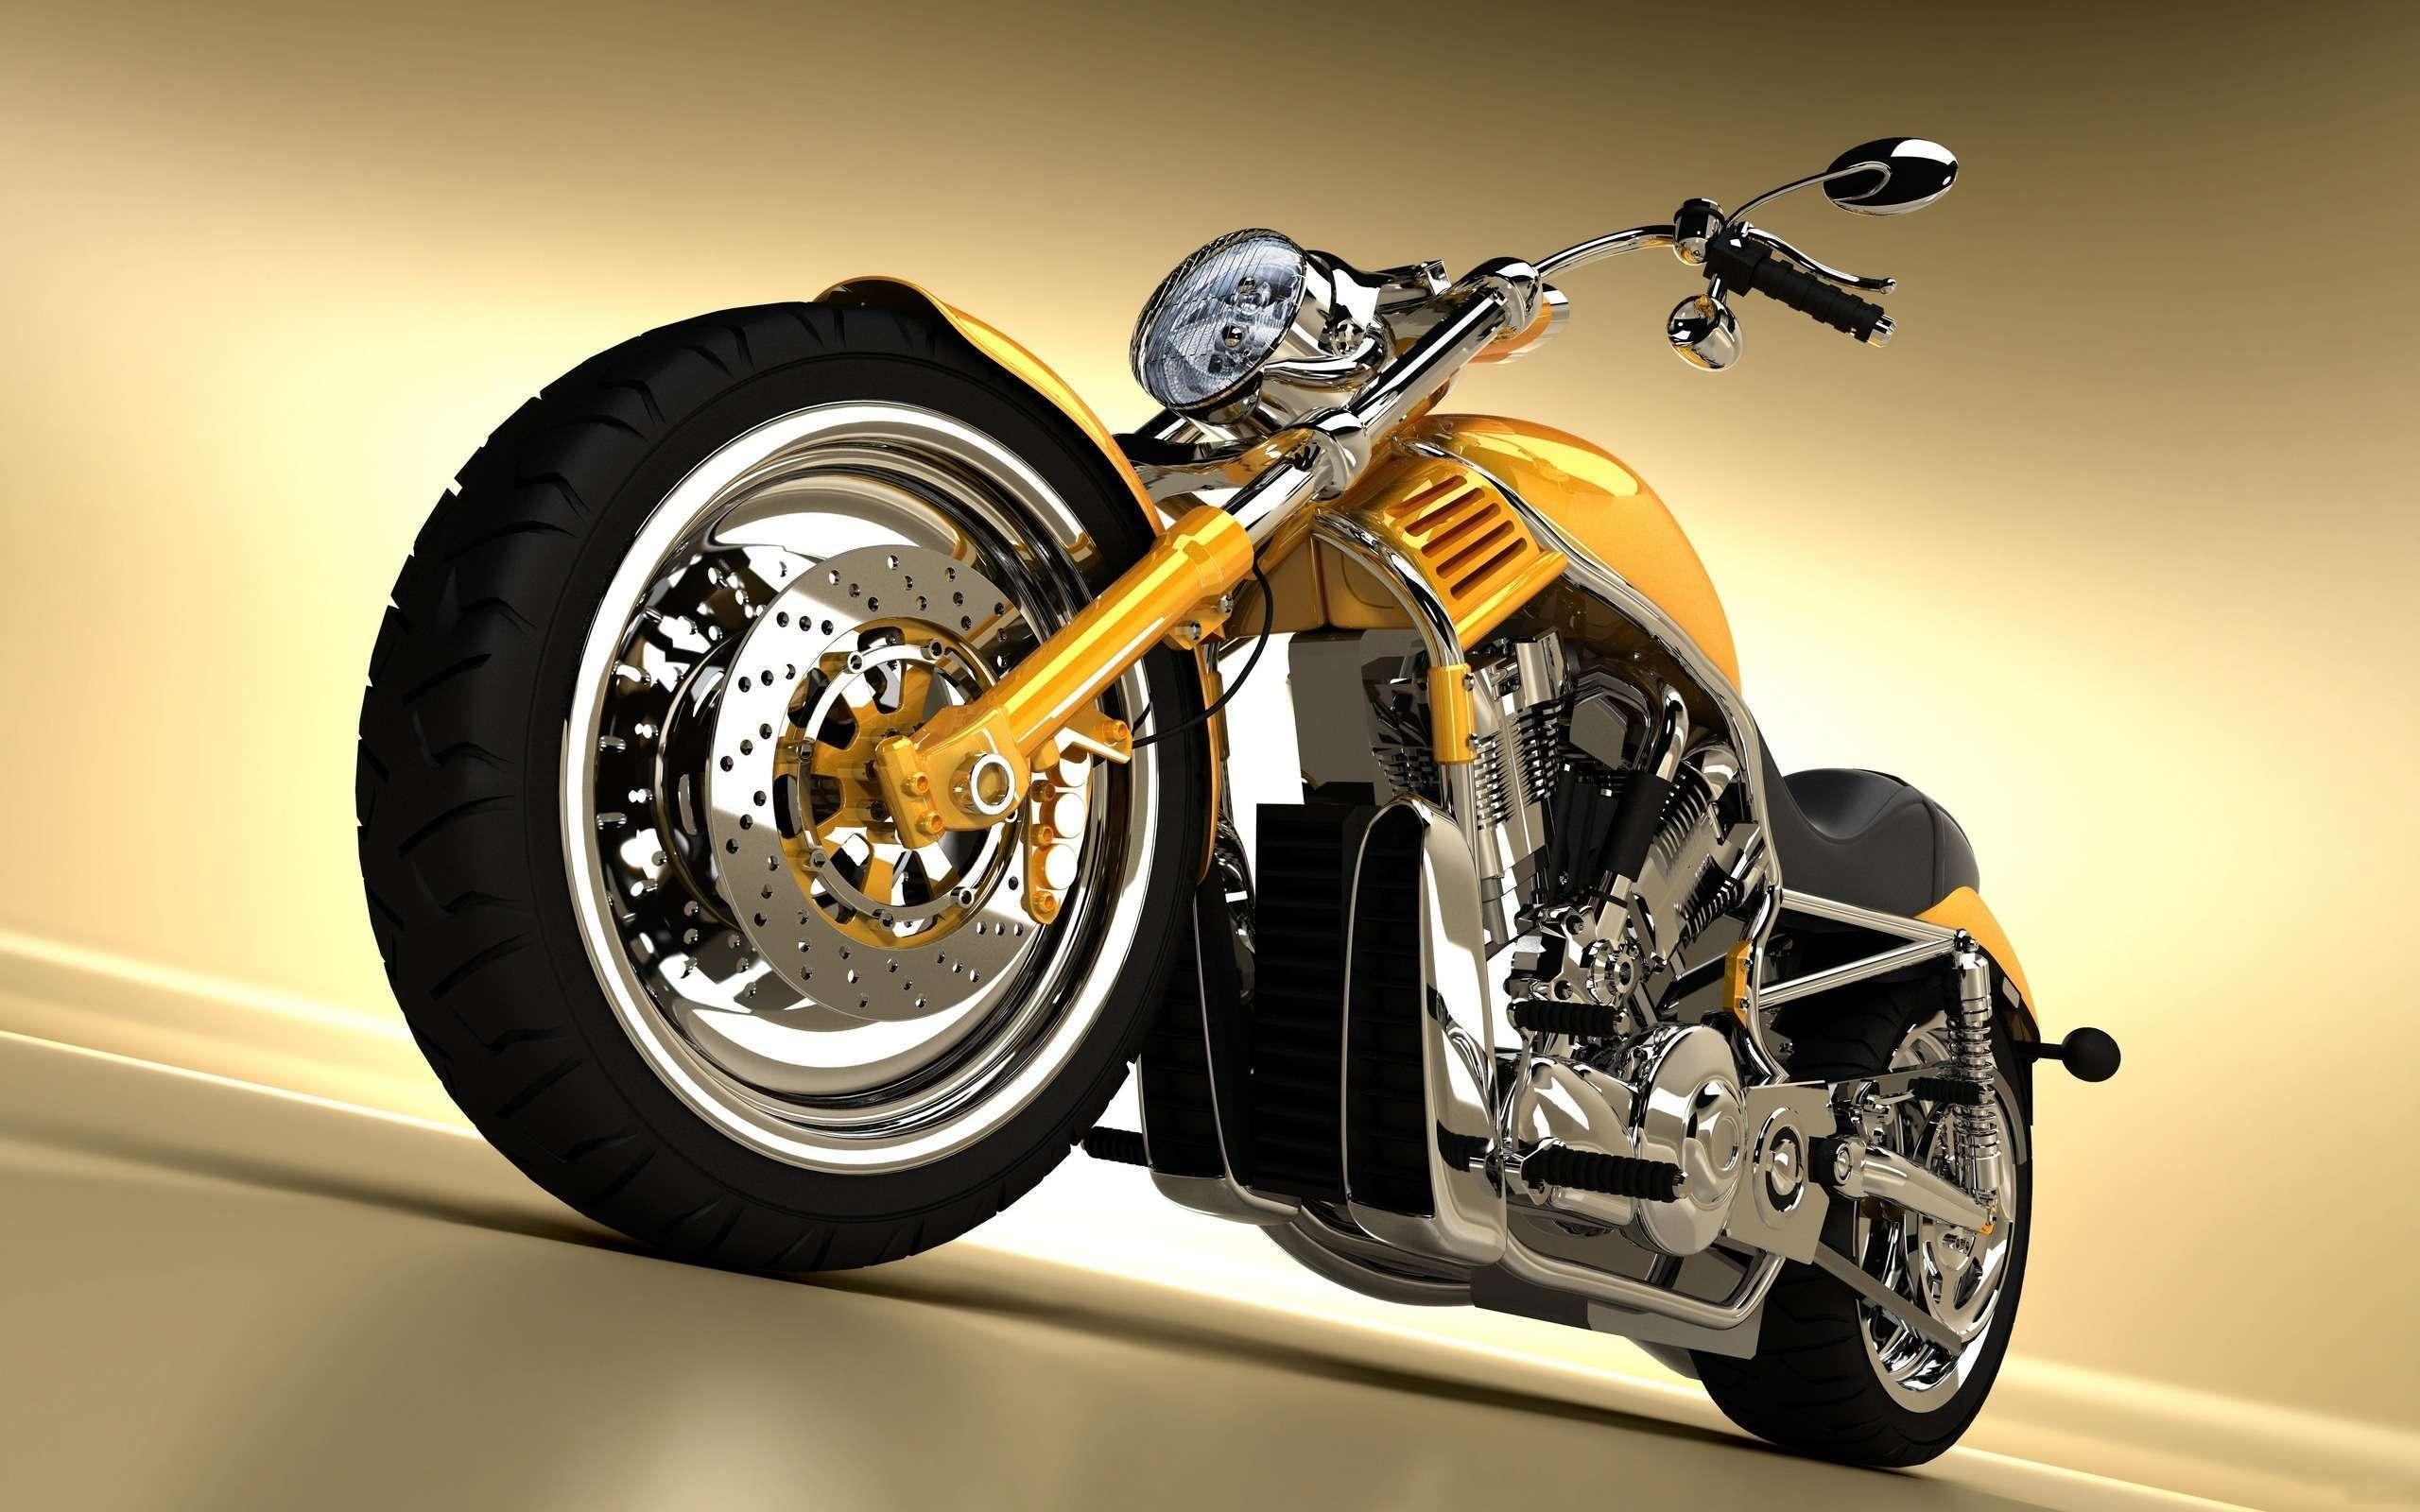 Yellow Bmw Bike Wallpaper Bmw Bike And Car 103778 Hd